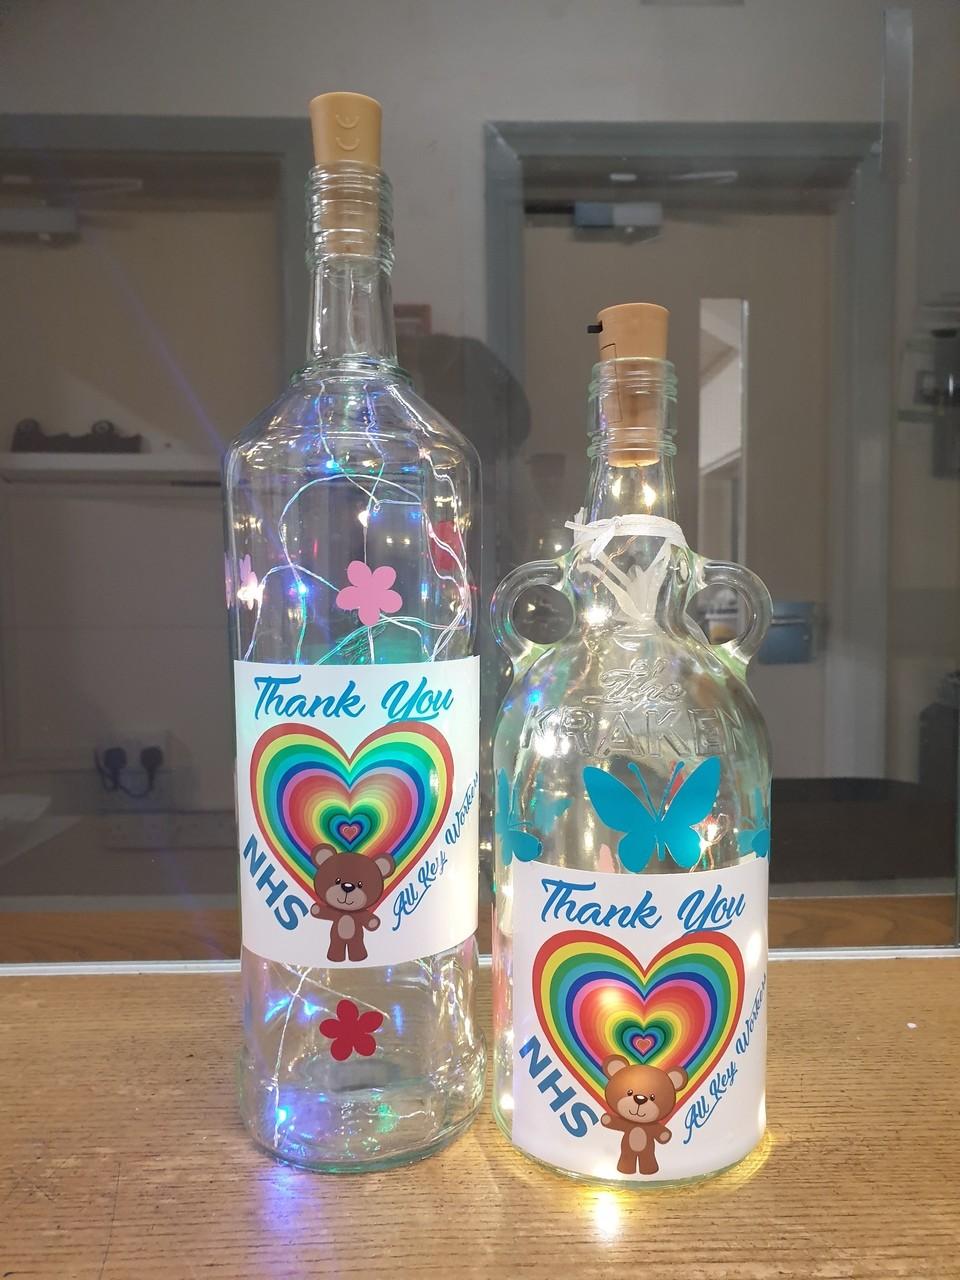 Thank you NHS decorated bottles! | Asda Killingbeck